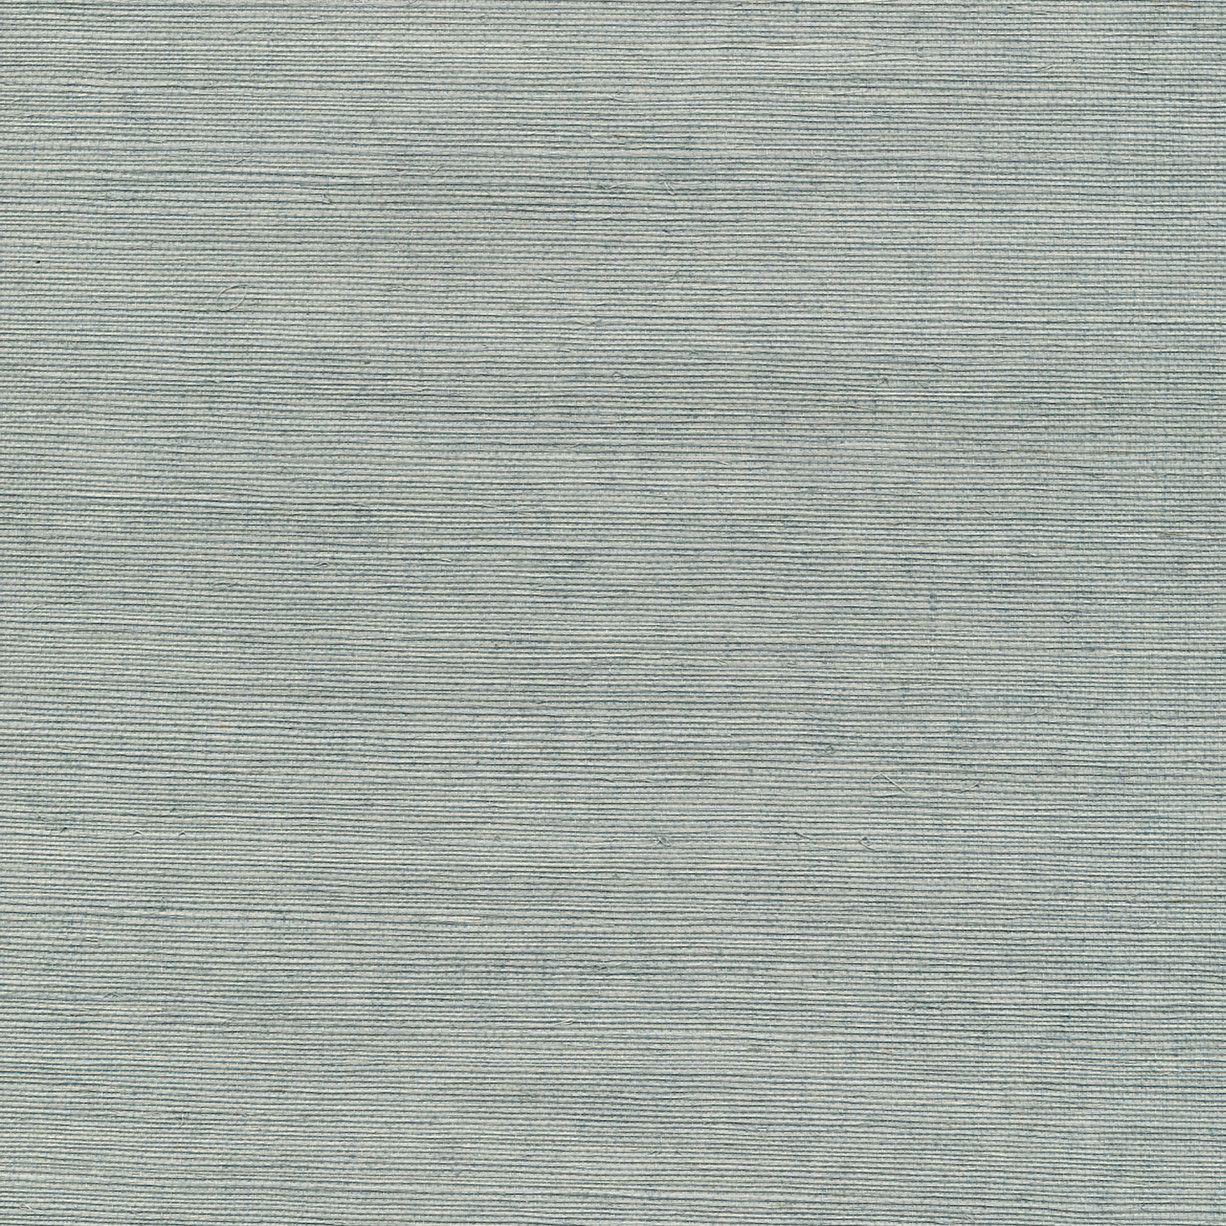 Brewster Home Fashions Zen Popun Grasscloth 24' x 36